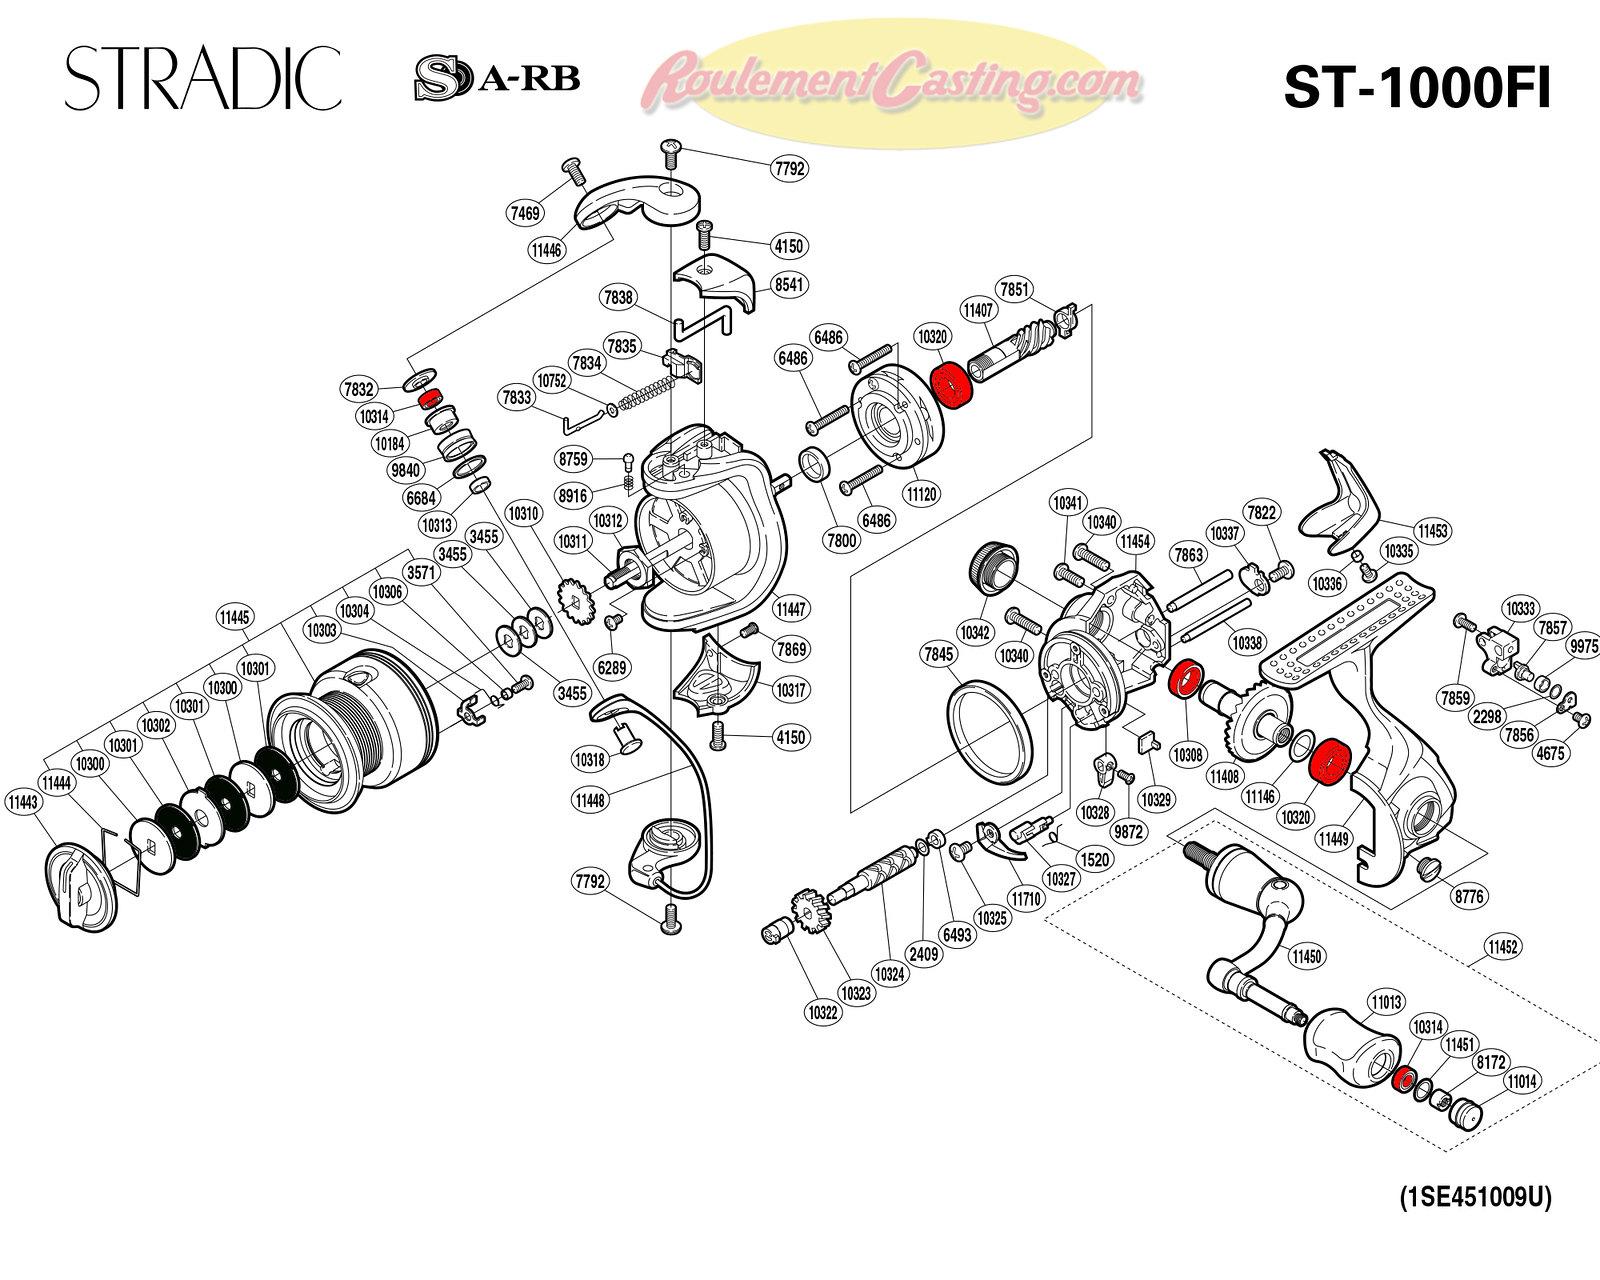 Schema-Stradic-1000FI